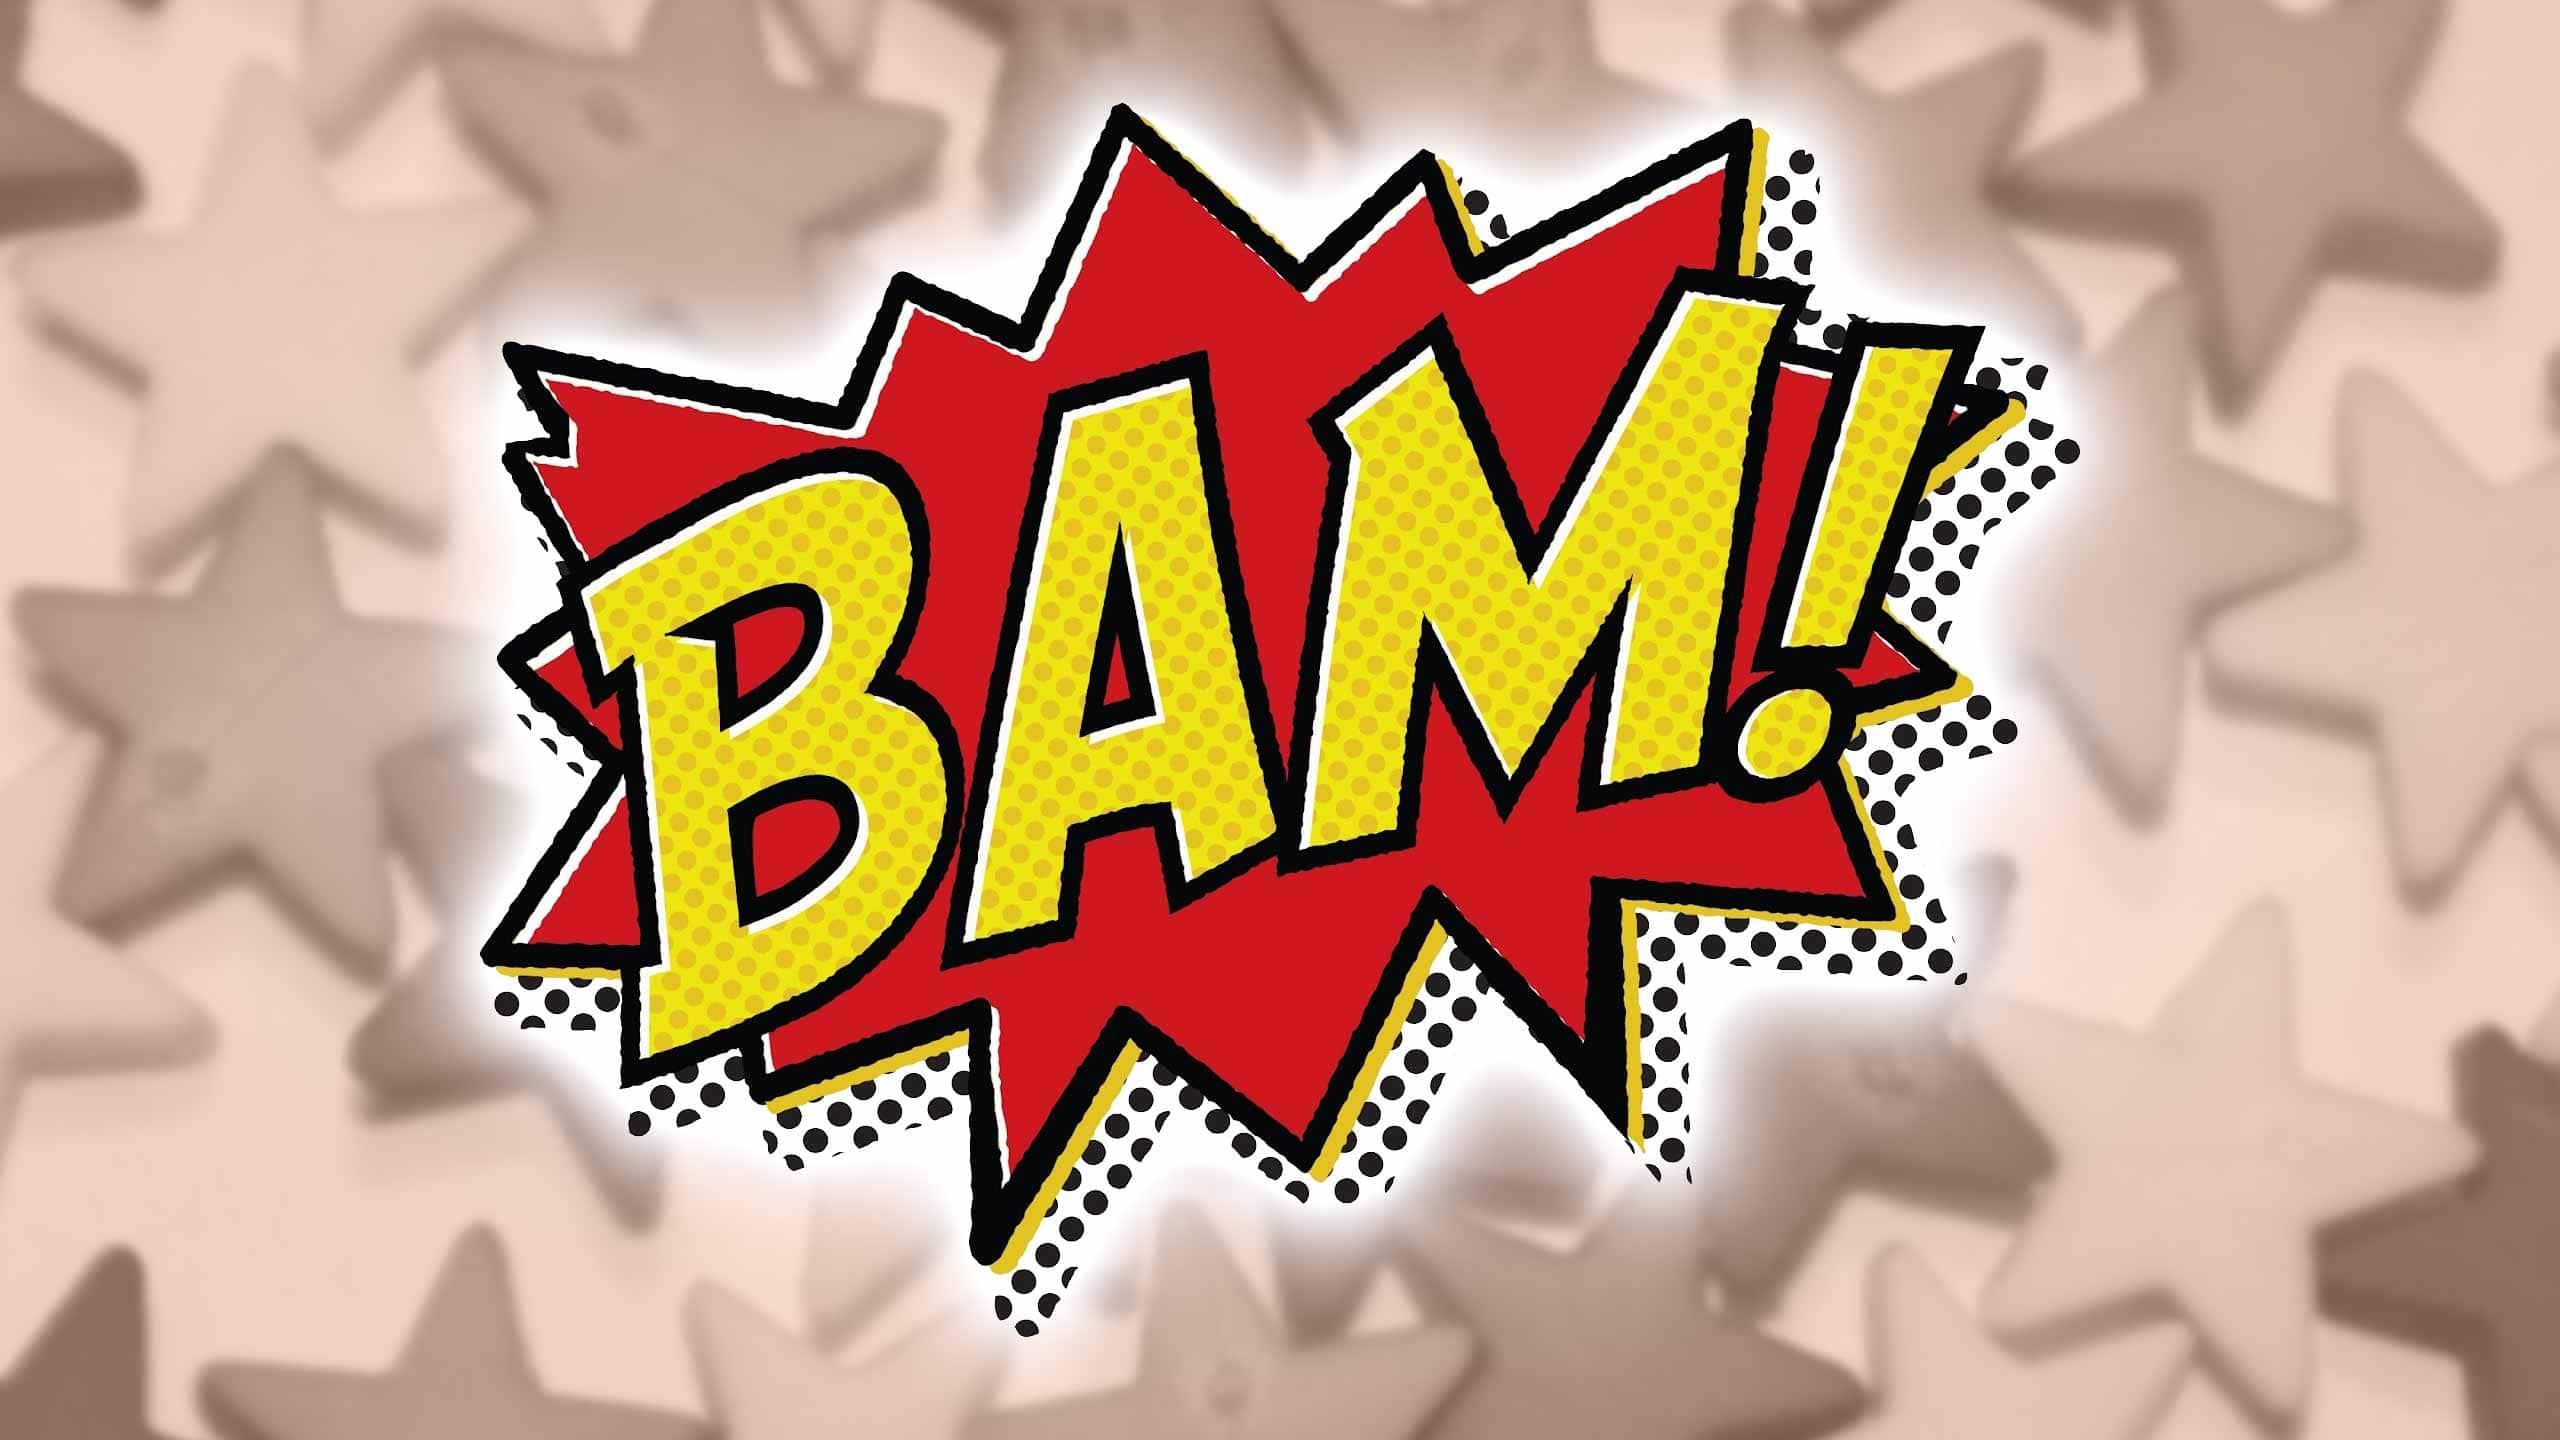 Cartoon BAM! graphic like those seen on the original 1960s Batman TV Series